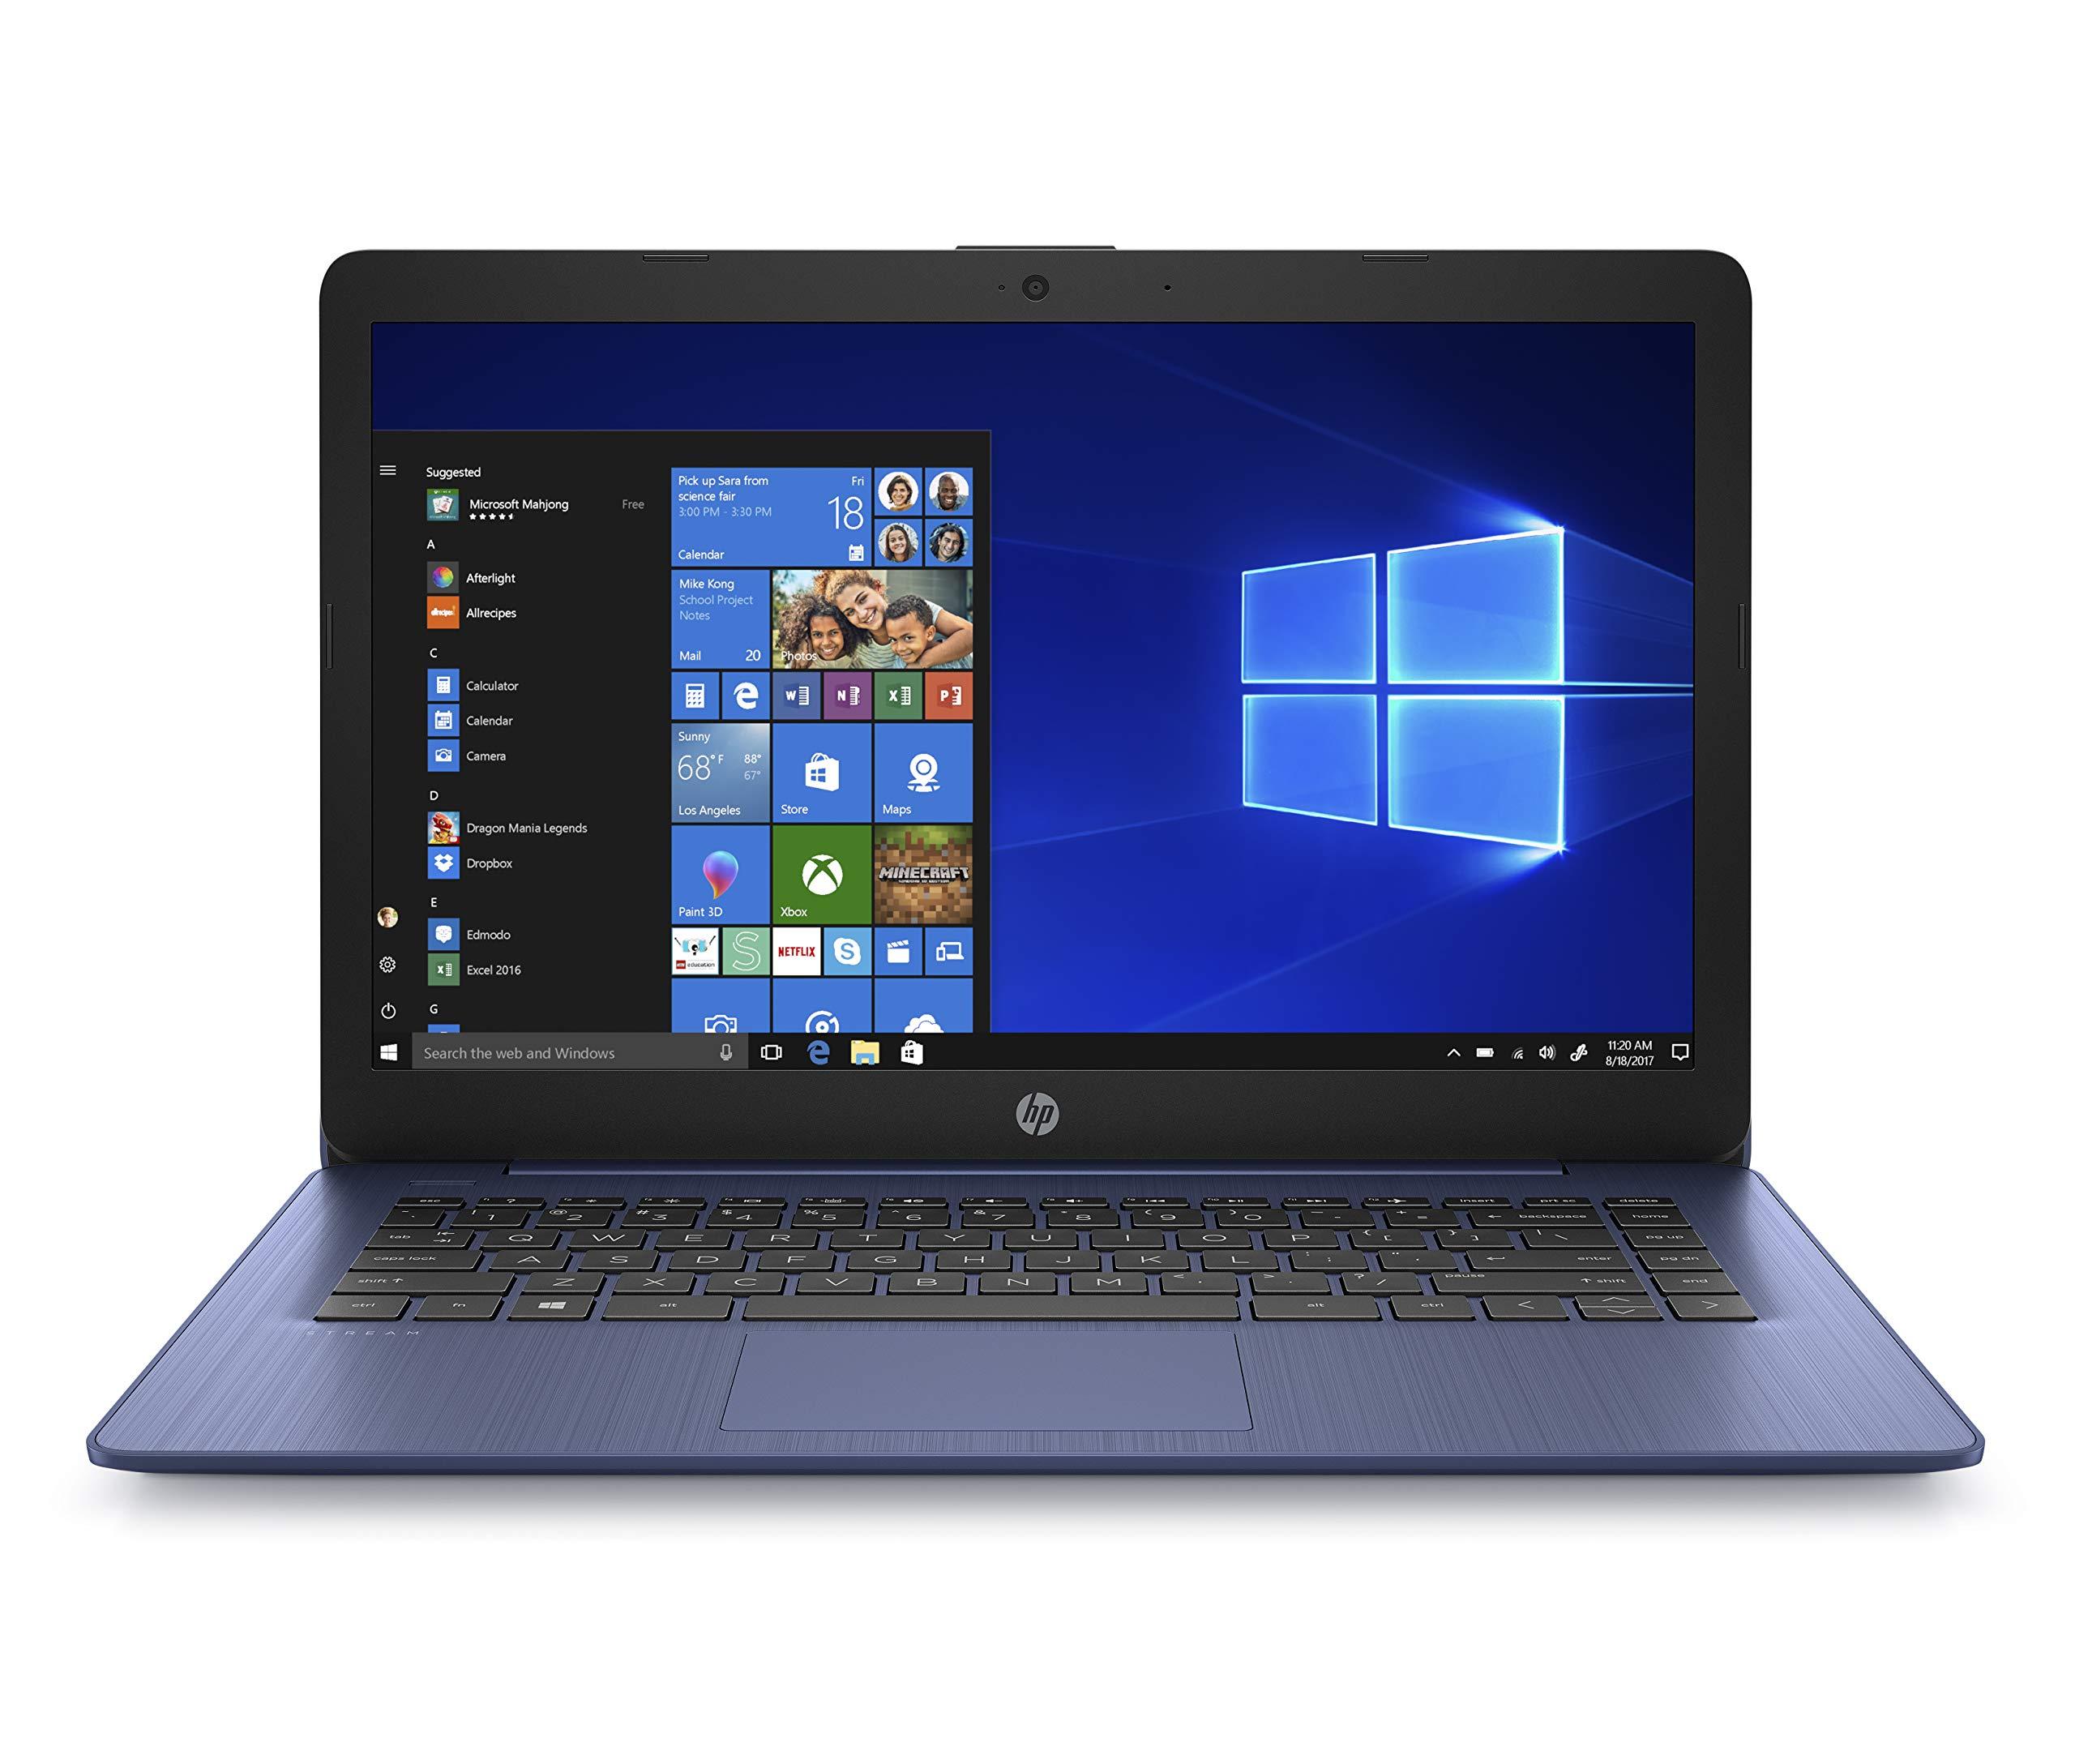 hp-stream-14-hd1366x768-display-intel-celeron-n4000-dual-core-processor-4gb-ram-32gb-emmc-hdmi-wifi-webcam-bluetooth-win10-s-royal-blue-14-cb161wm-renewed